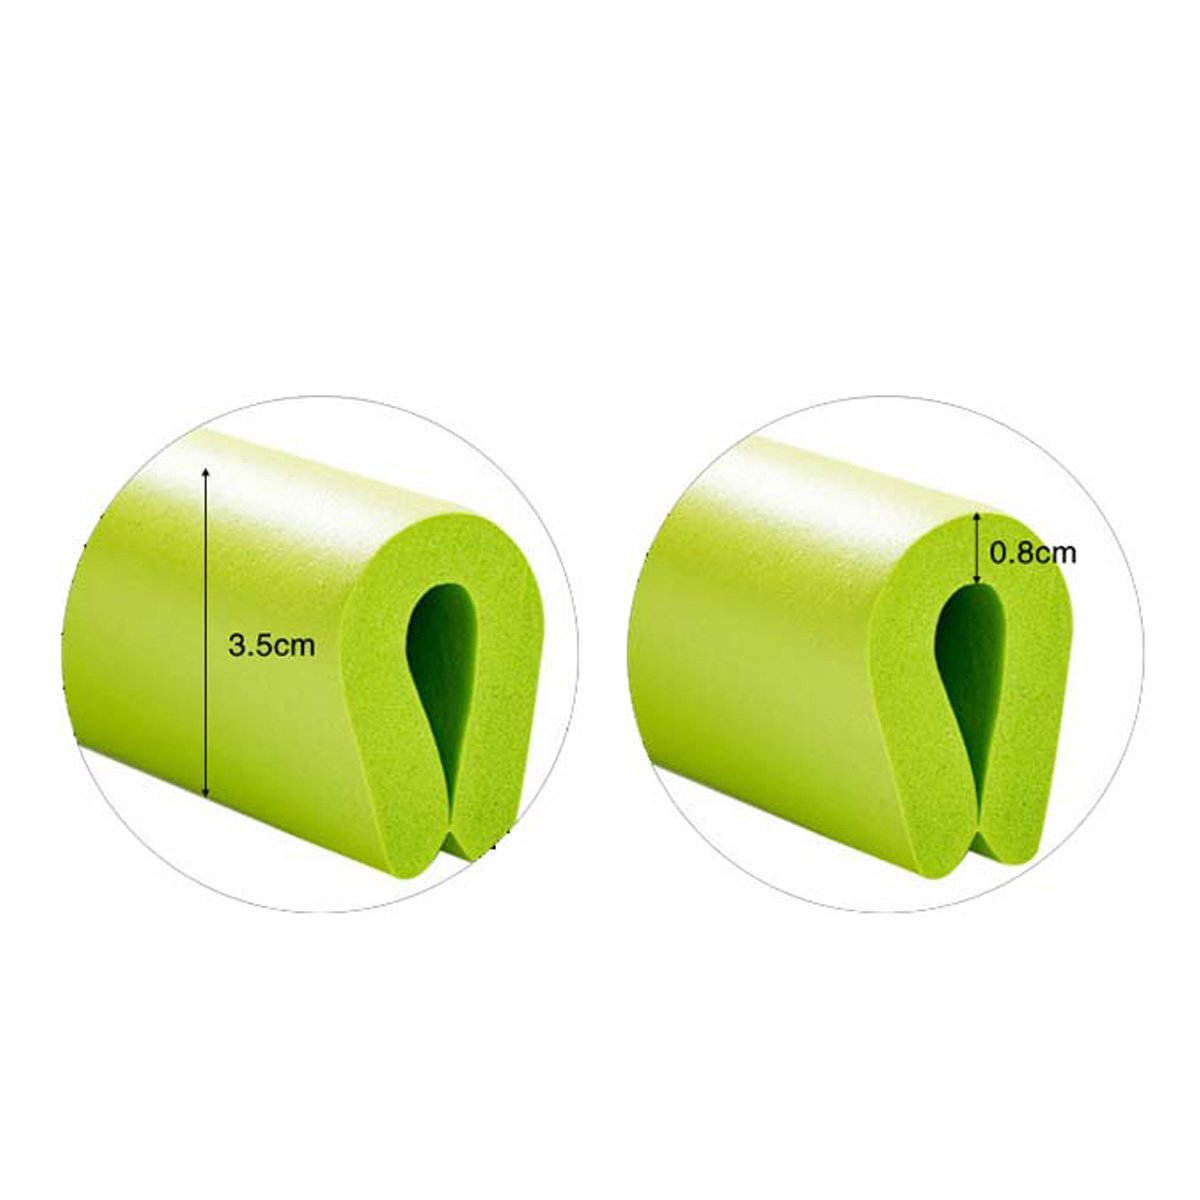 Ancdream Protector 2m Esquina Mesa Mueble Antigolpes Seguridad para Ni/ños Beb/é